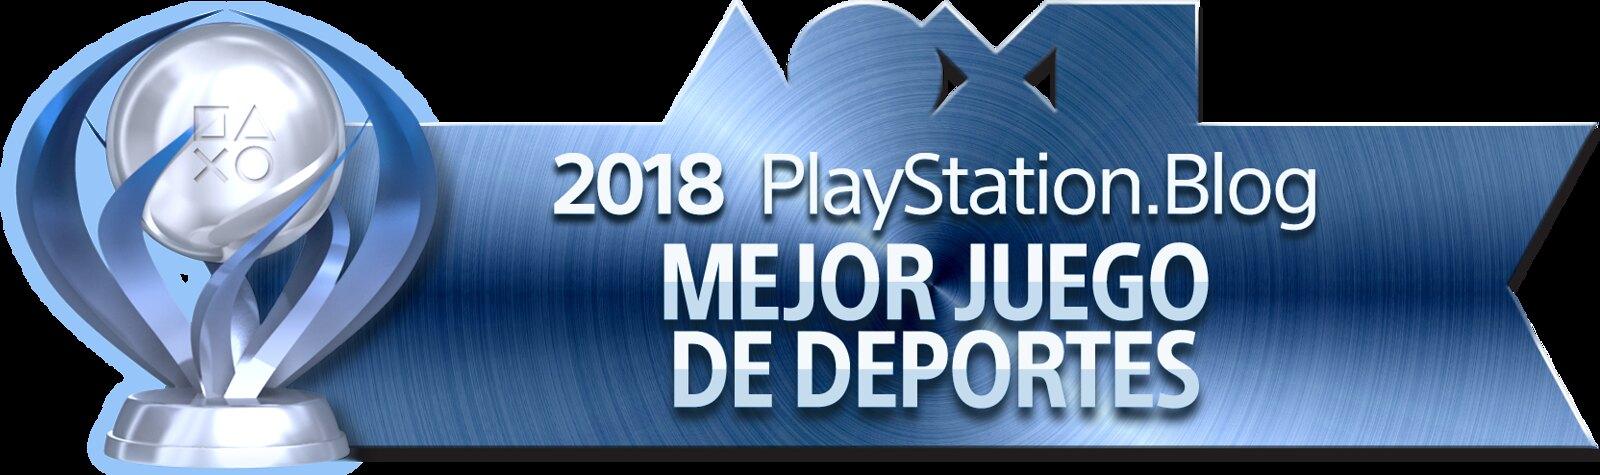 Best Sports Game - Platinum